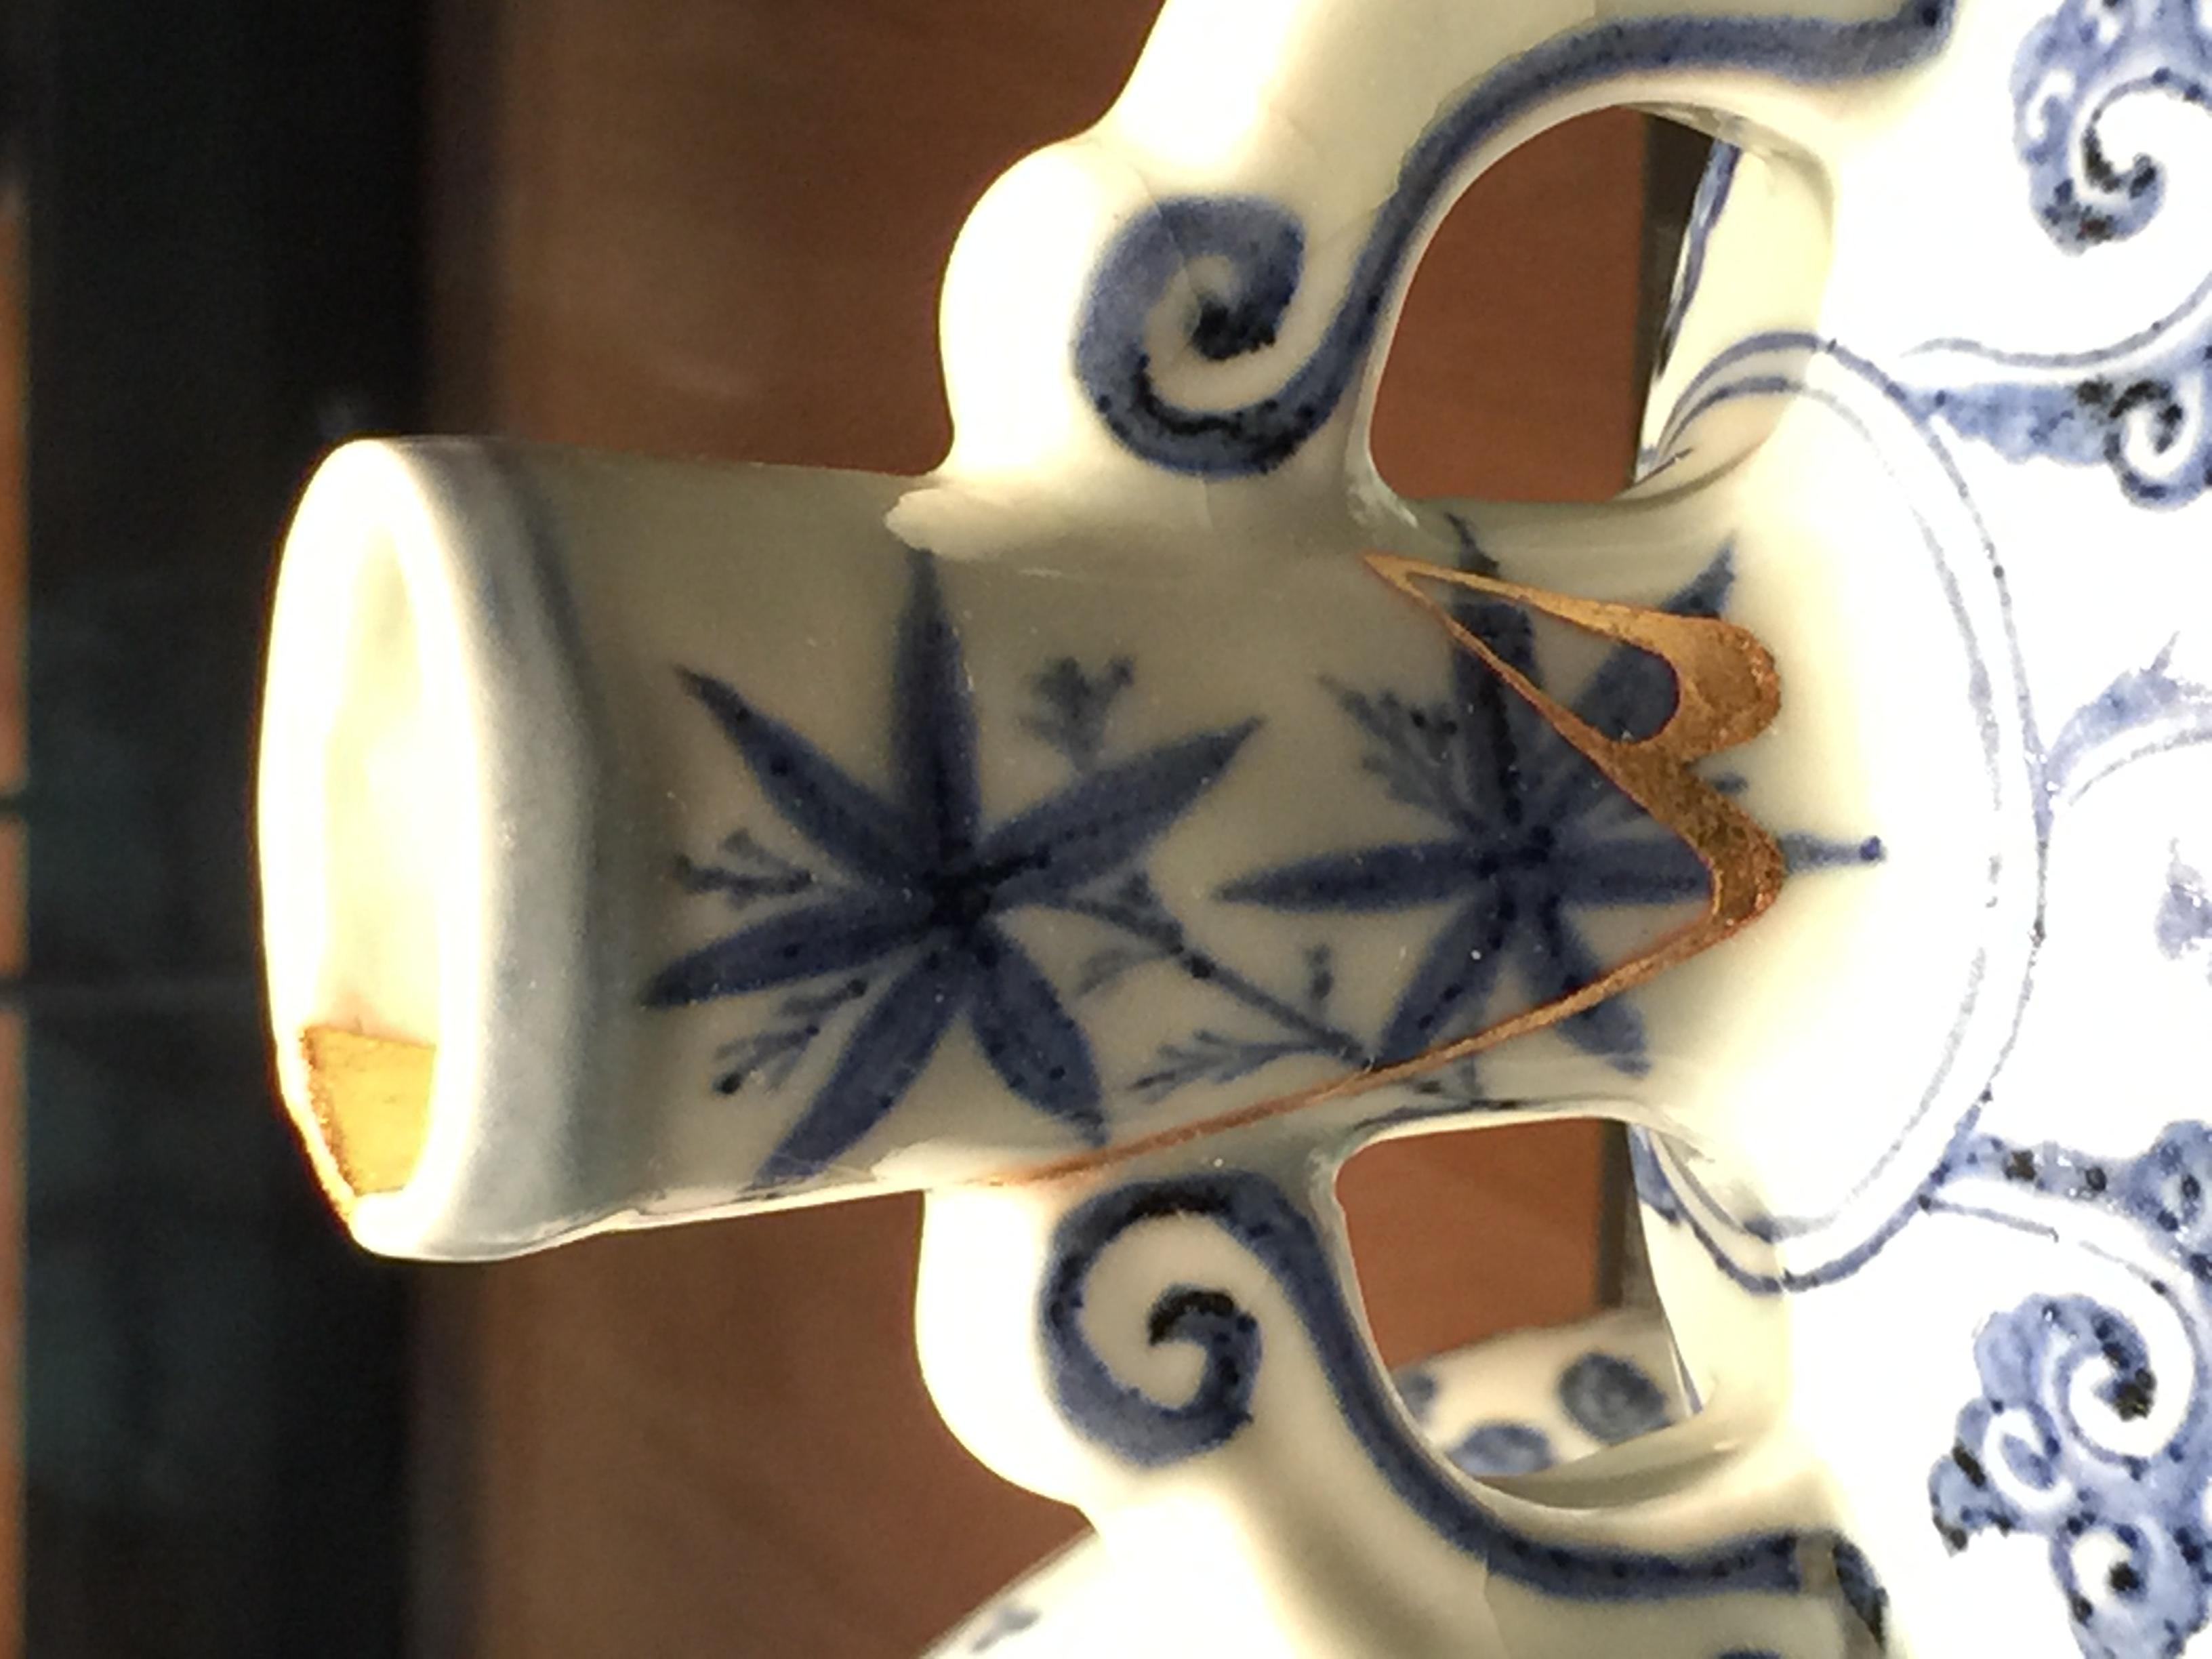 Chinese-Porcelain-British-Museum-Percival-David-jessewaugh.com-51.jpg